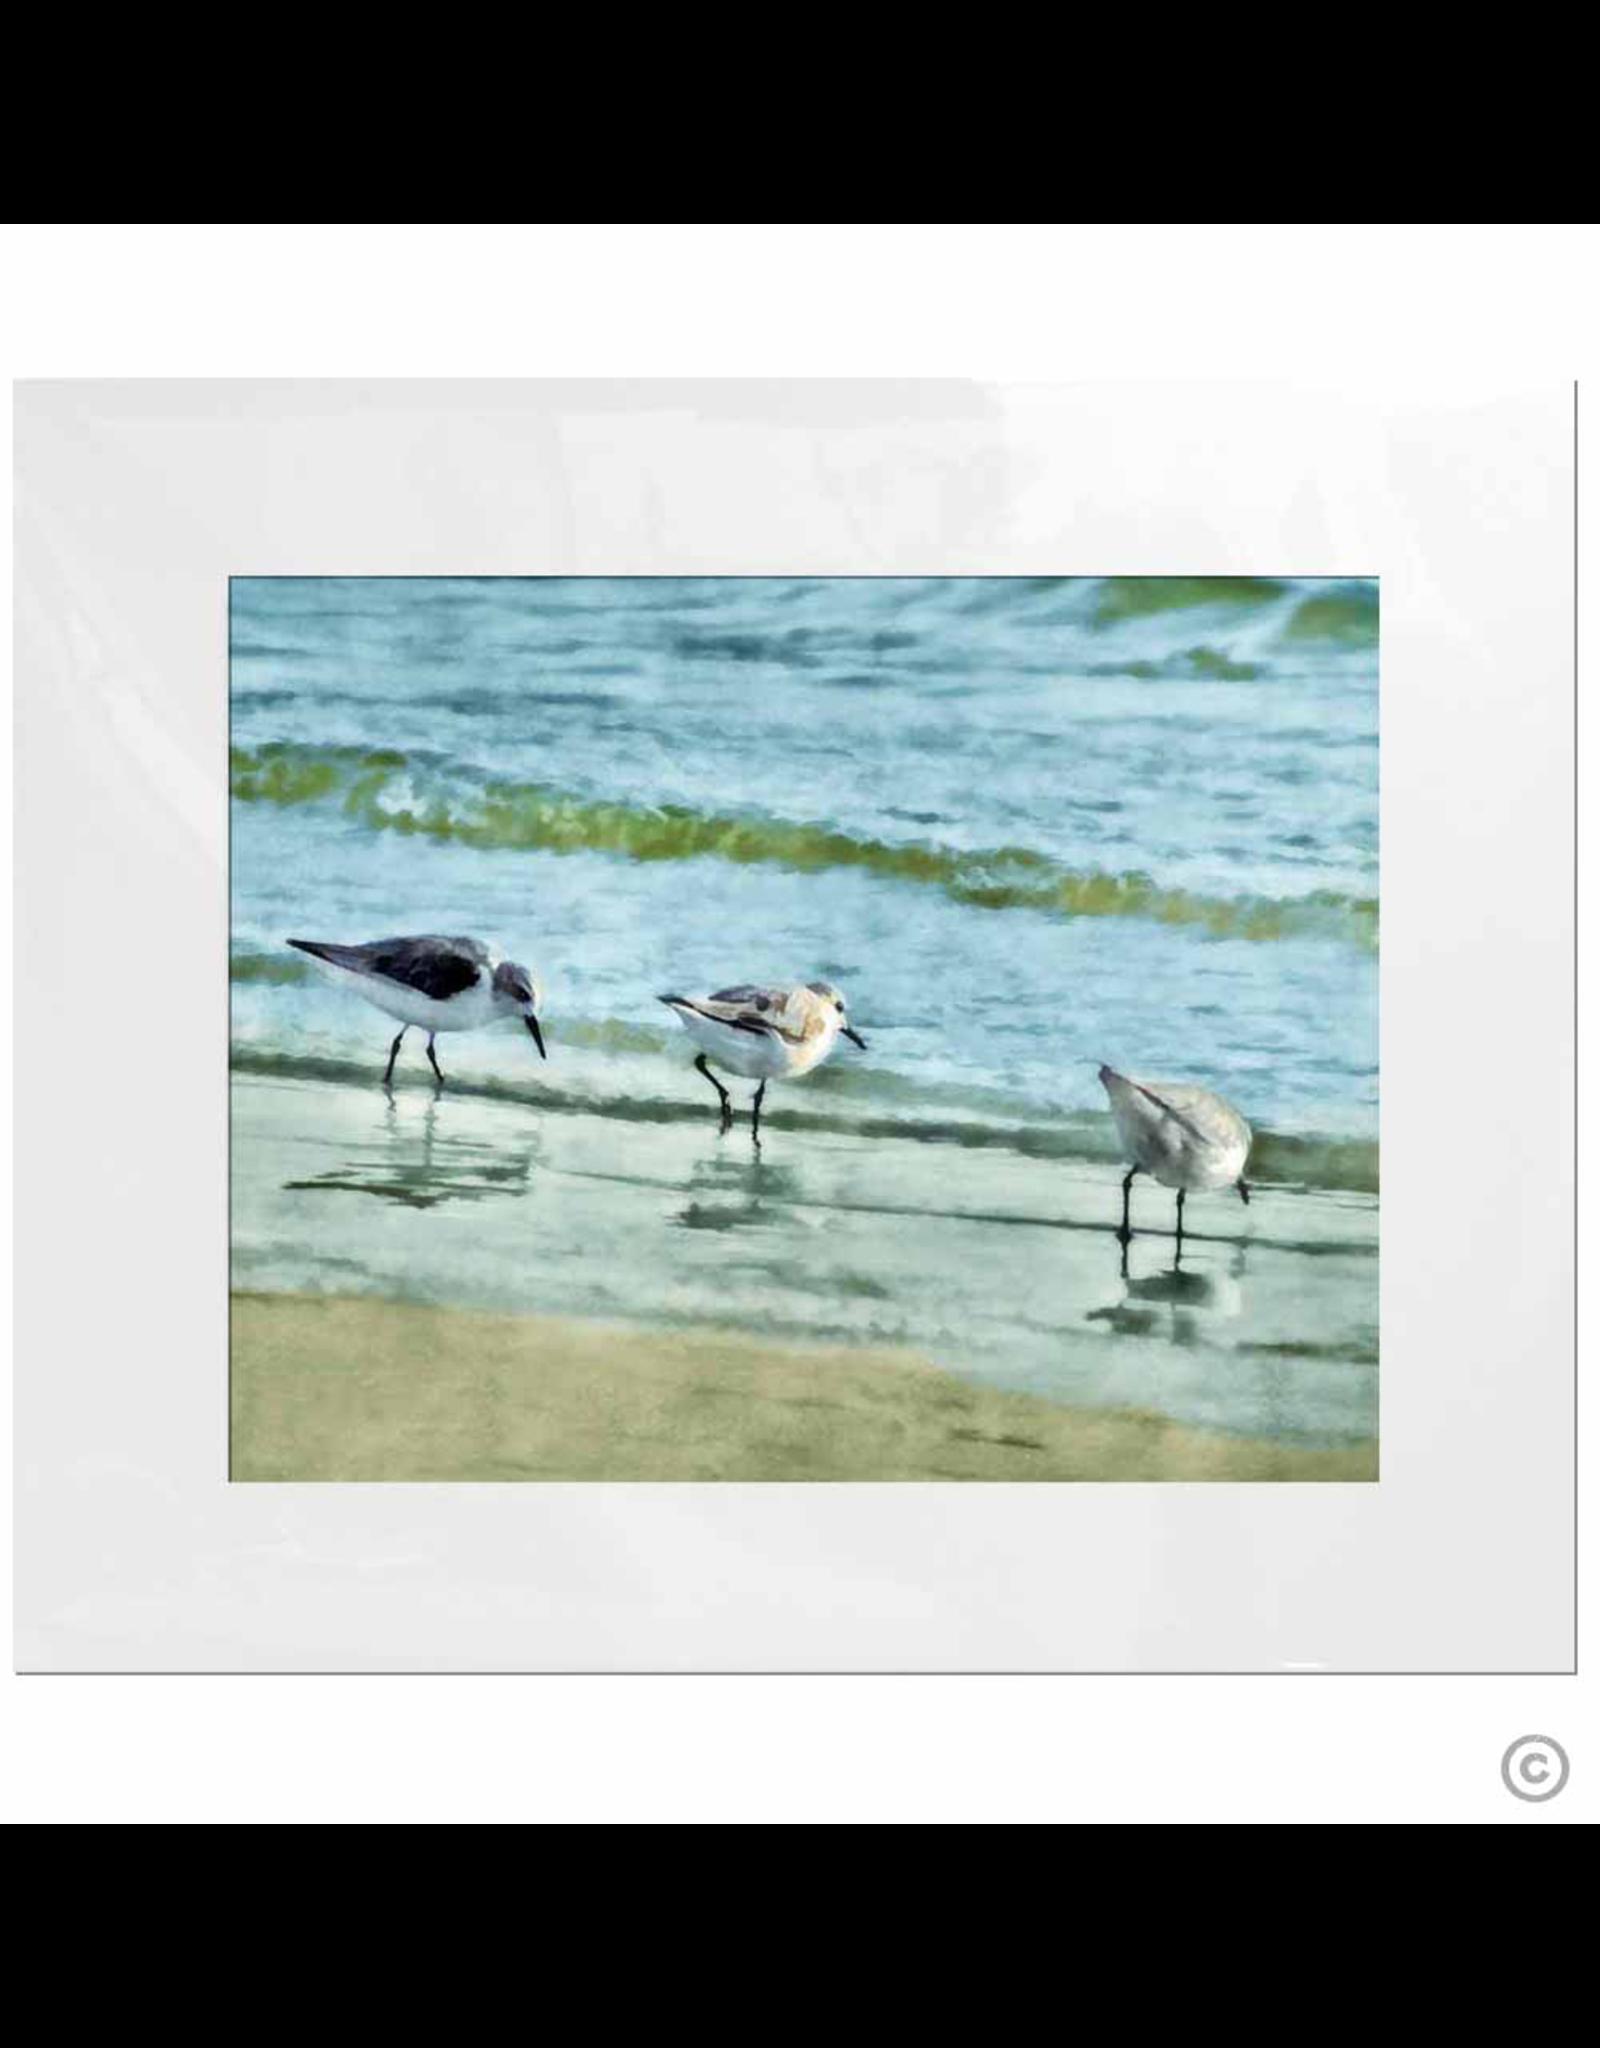 Maureen Terrien Photography Art Print 3 Sandpipers I 11x14 - 8x10 Matted